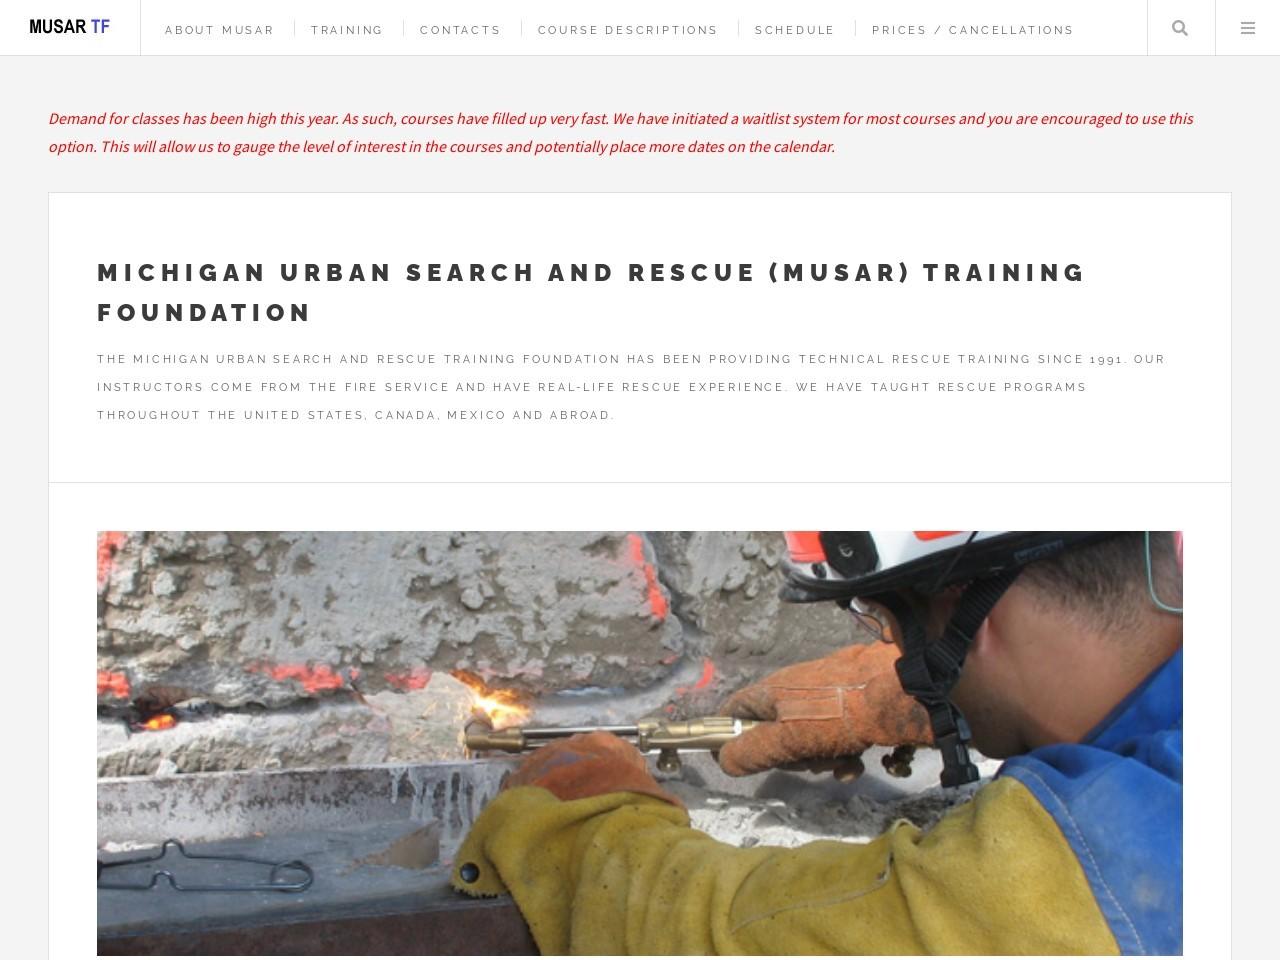 Social Media & Marketing Services | Jevelme Digital Marketing Expert